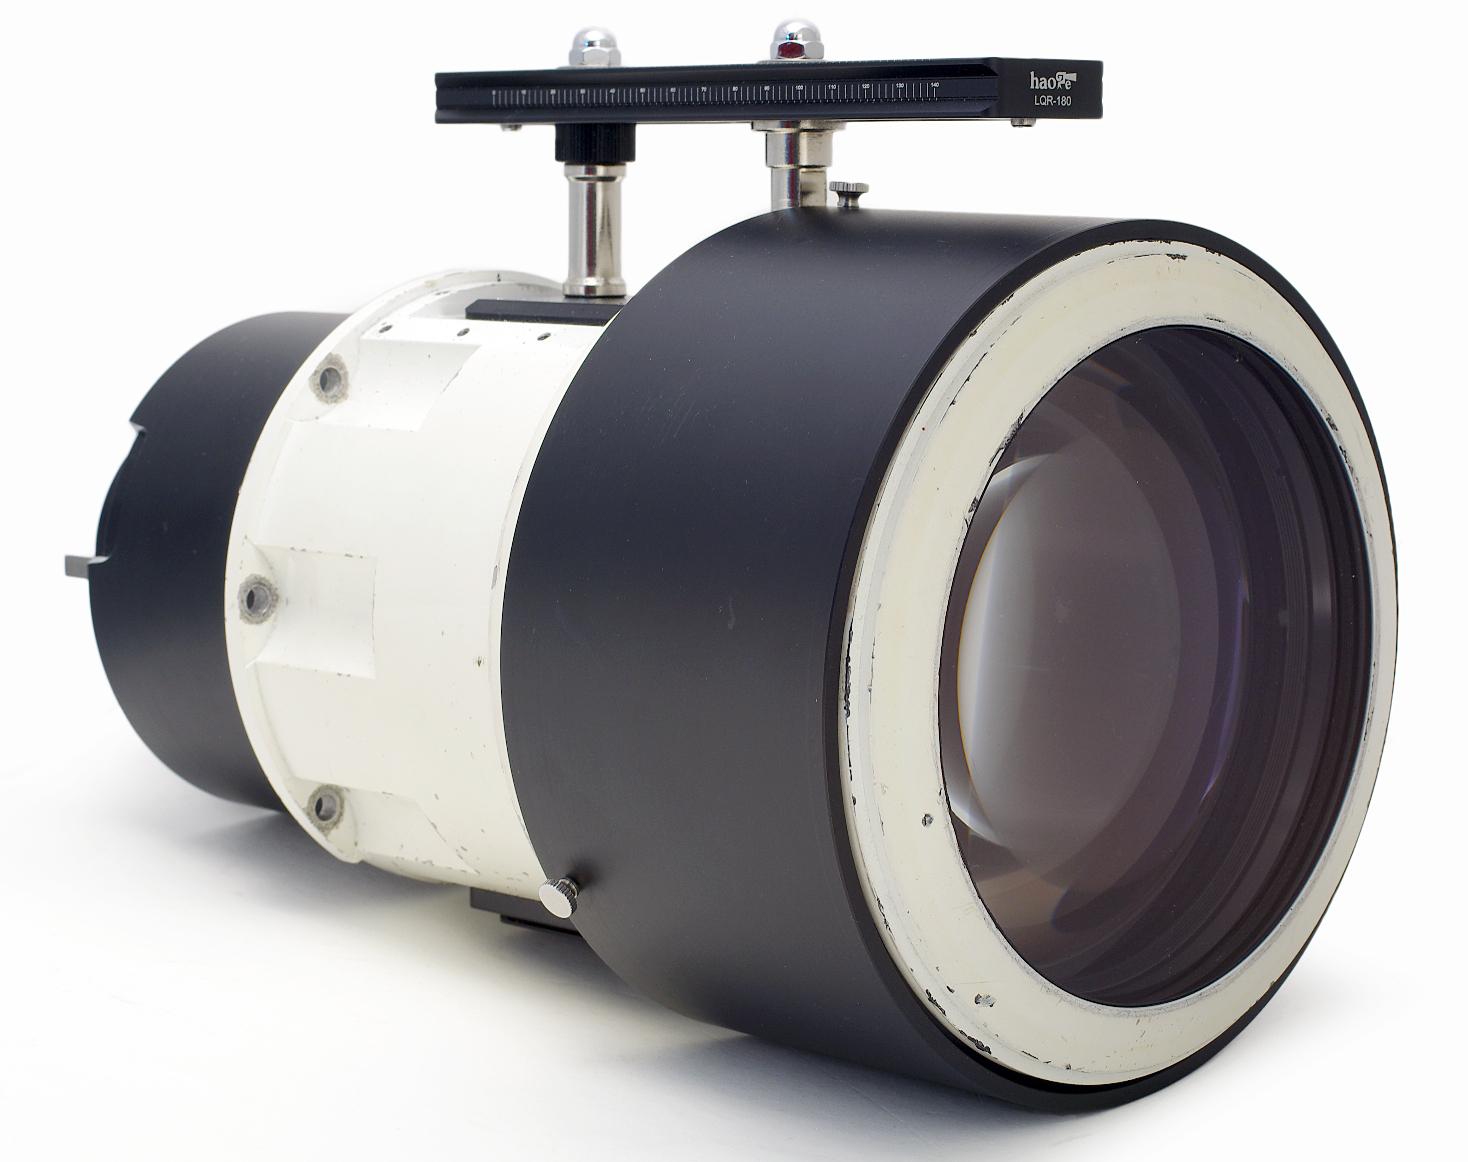 P-Angenieux-1-5-210-mm-Professional-re-mounted-to-Fujifilm-GFX Indexbild 3